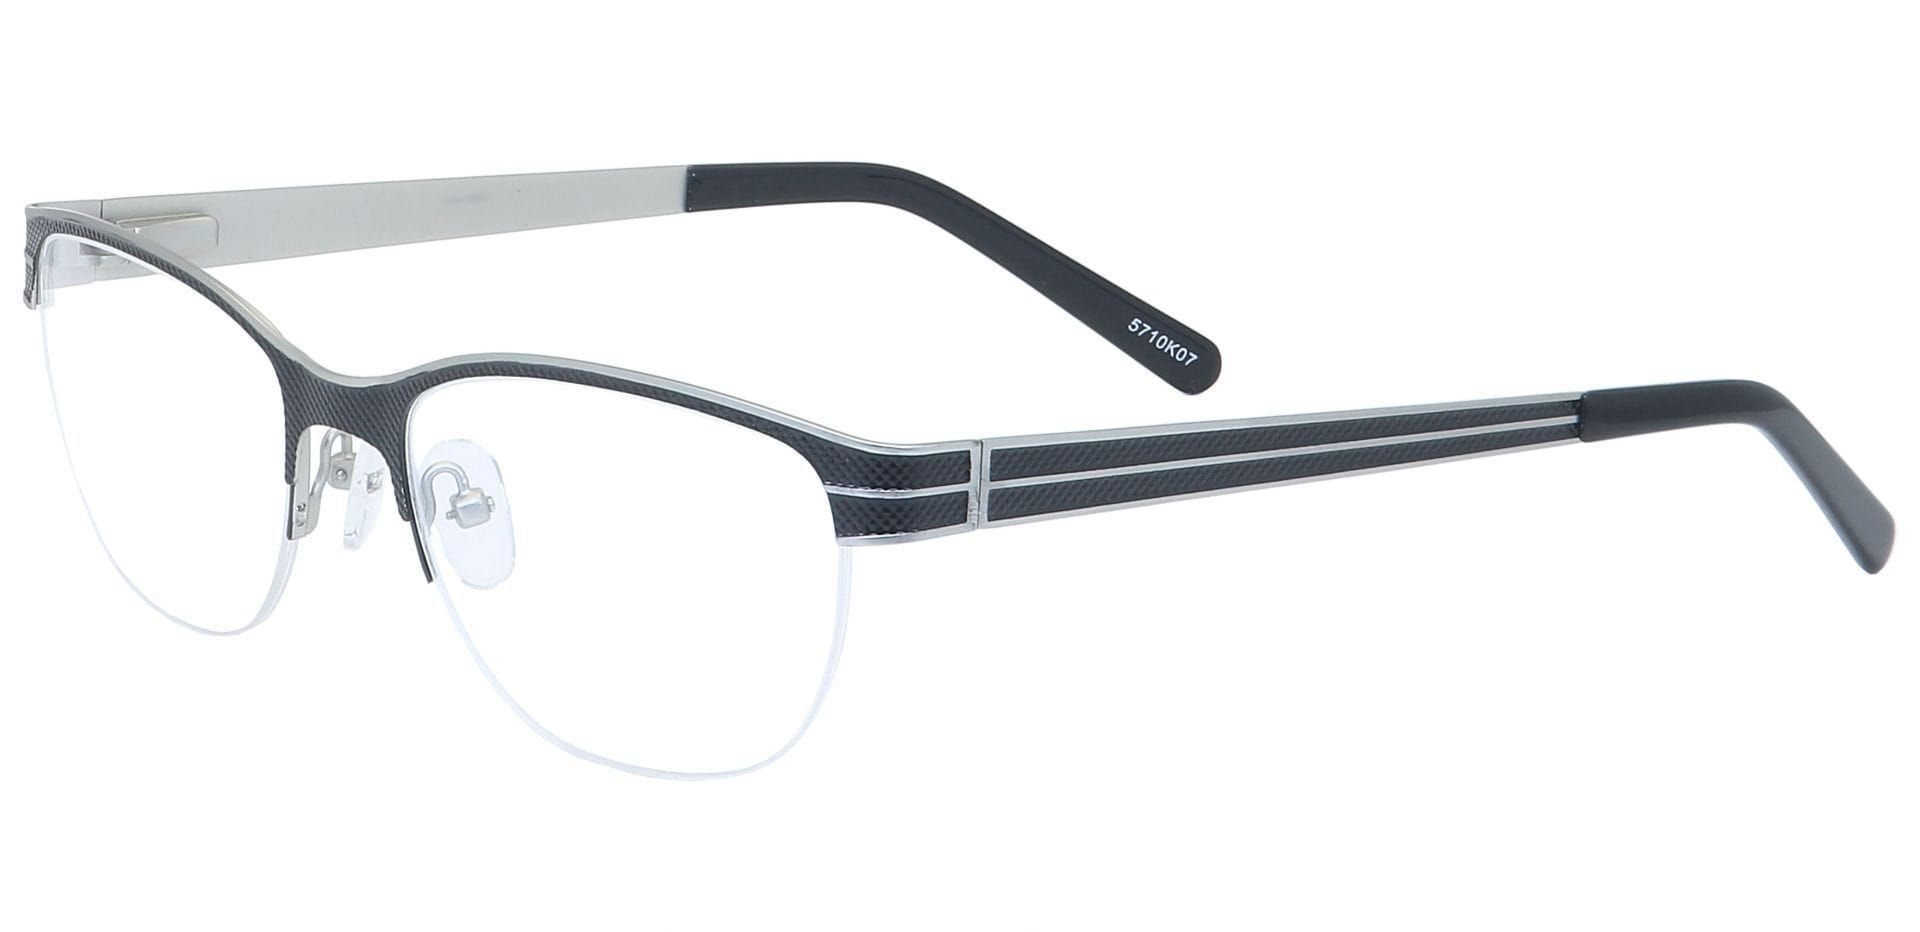 Arren Round Lined Bifocal Glasses - White